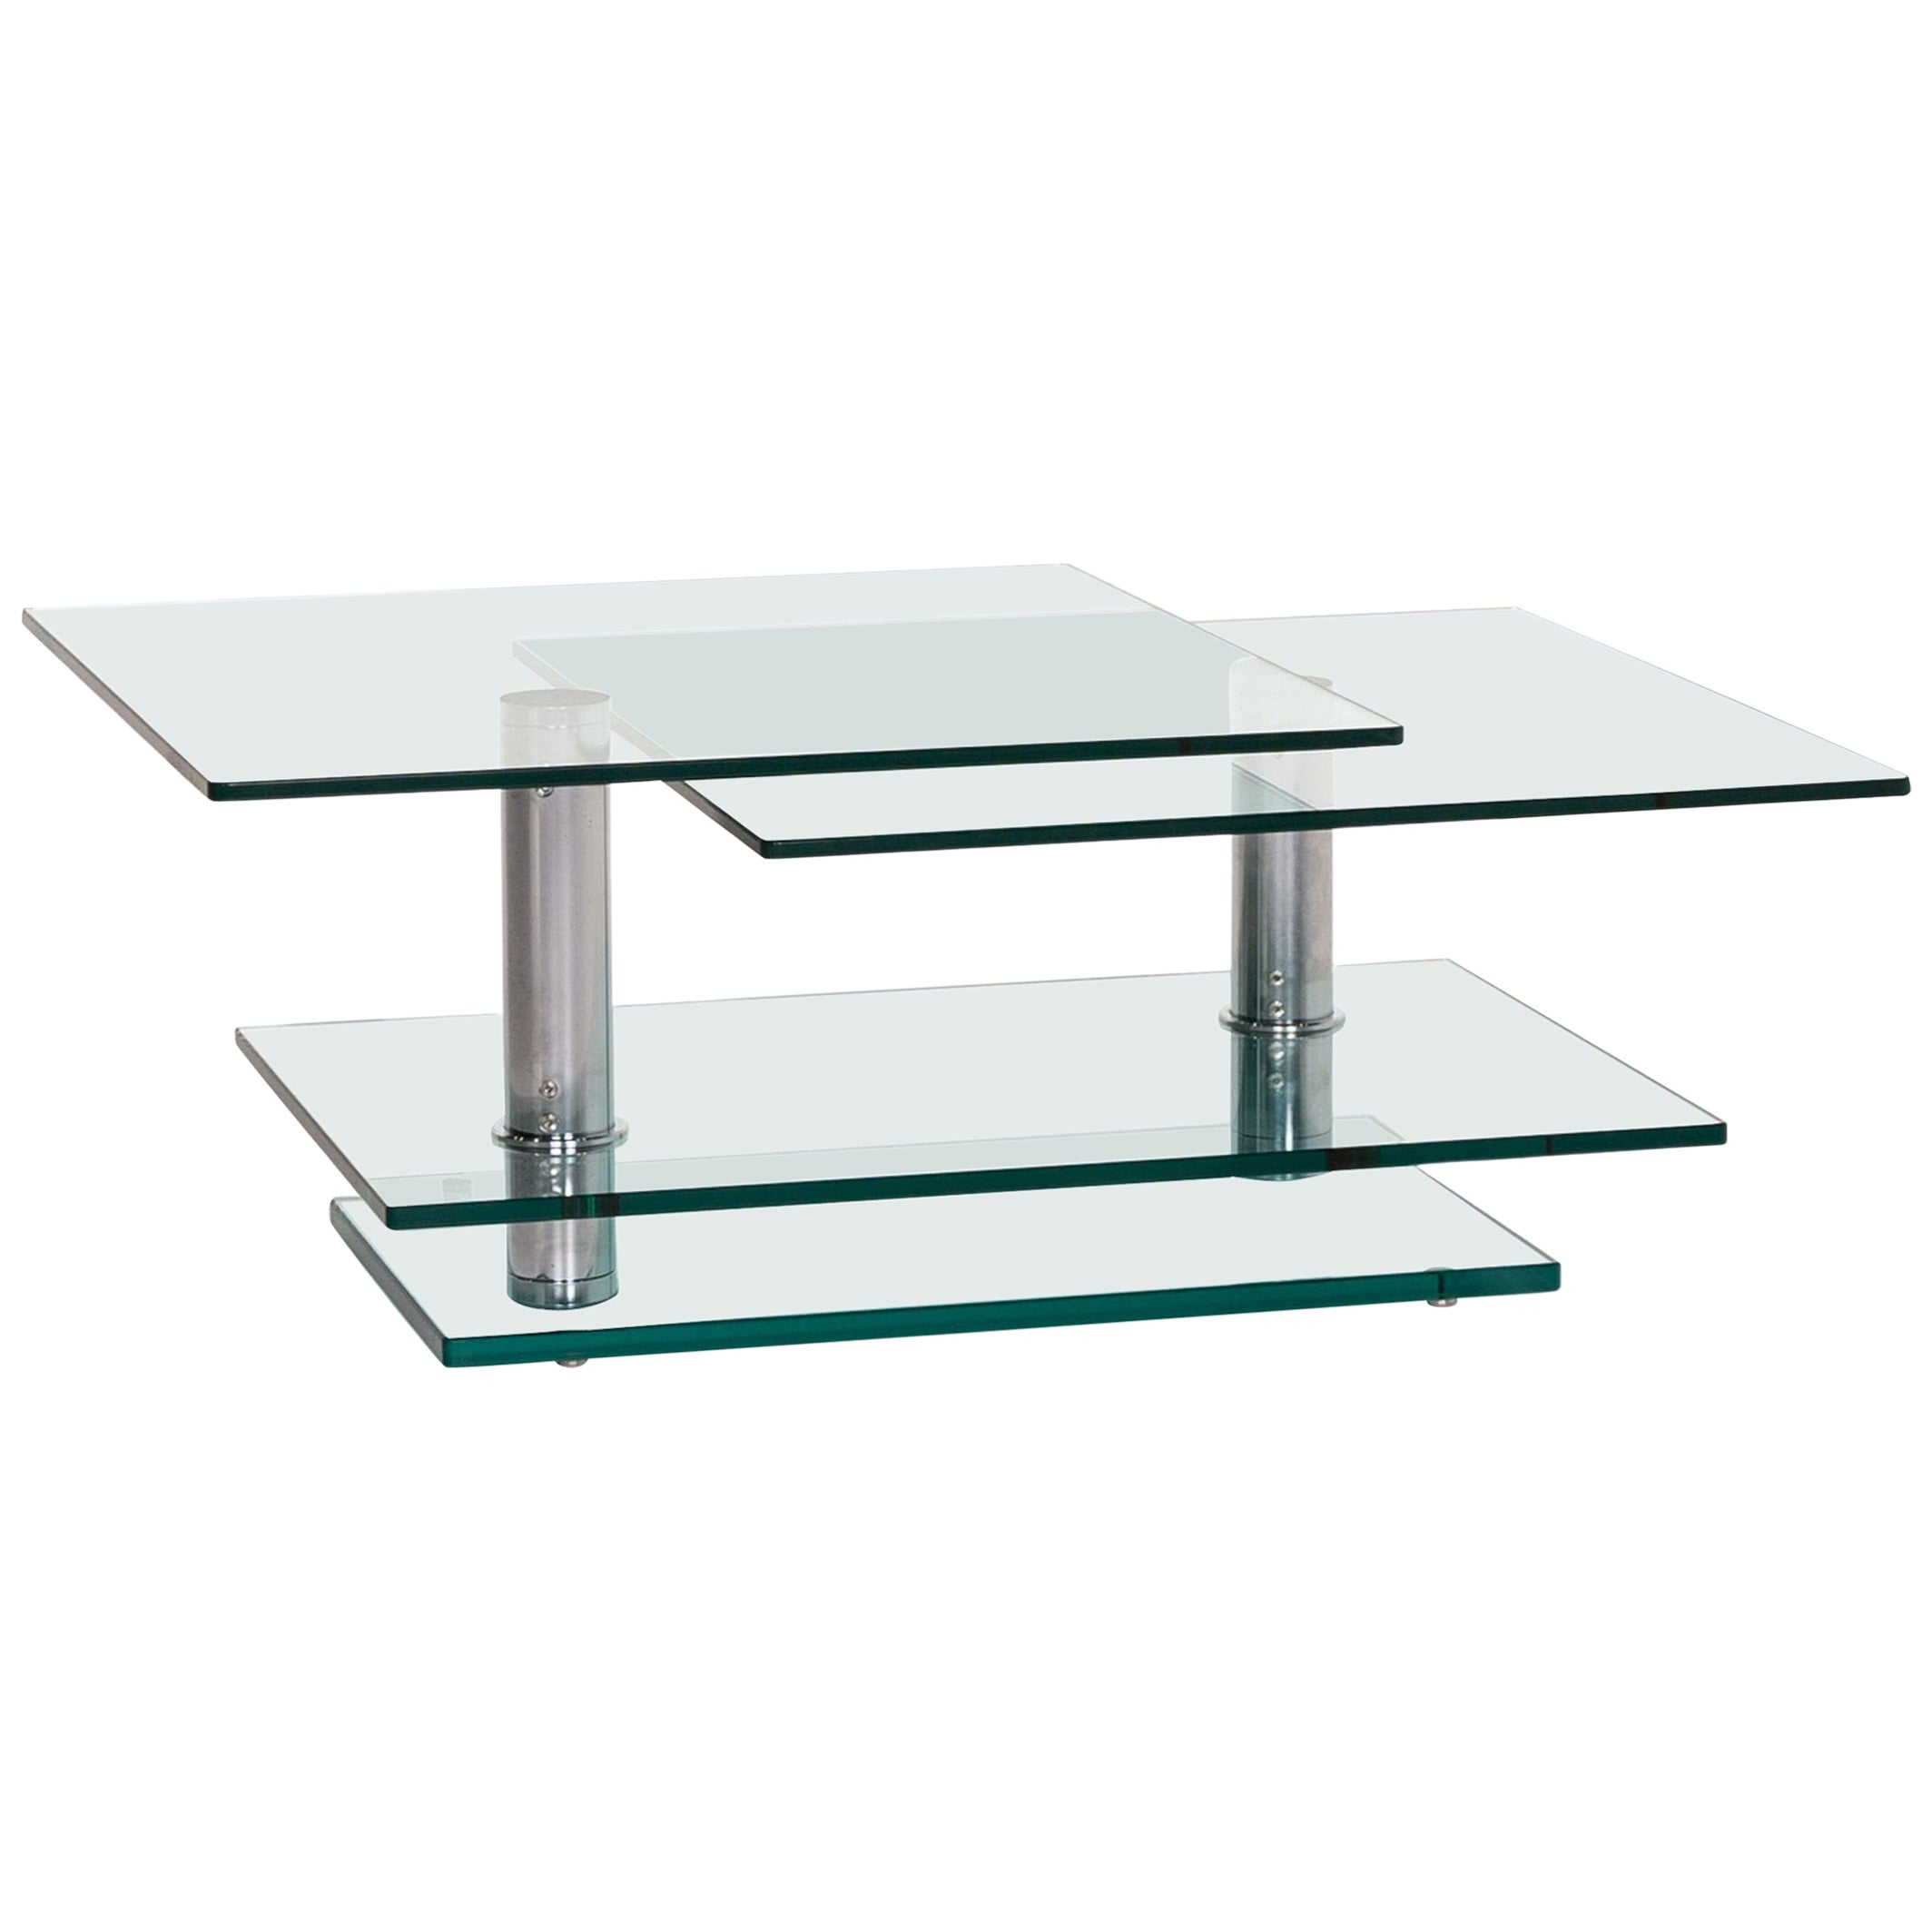 Ronald Schmitt K 500 Glass Coffee Table Metal Table Function Adjustable